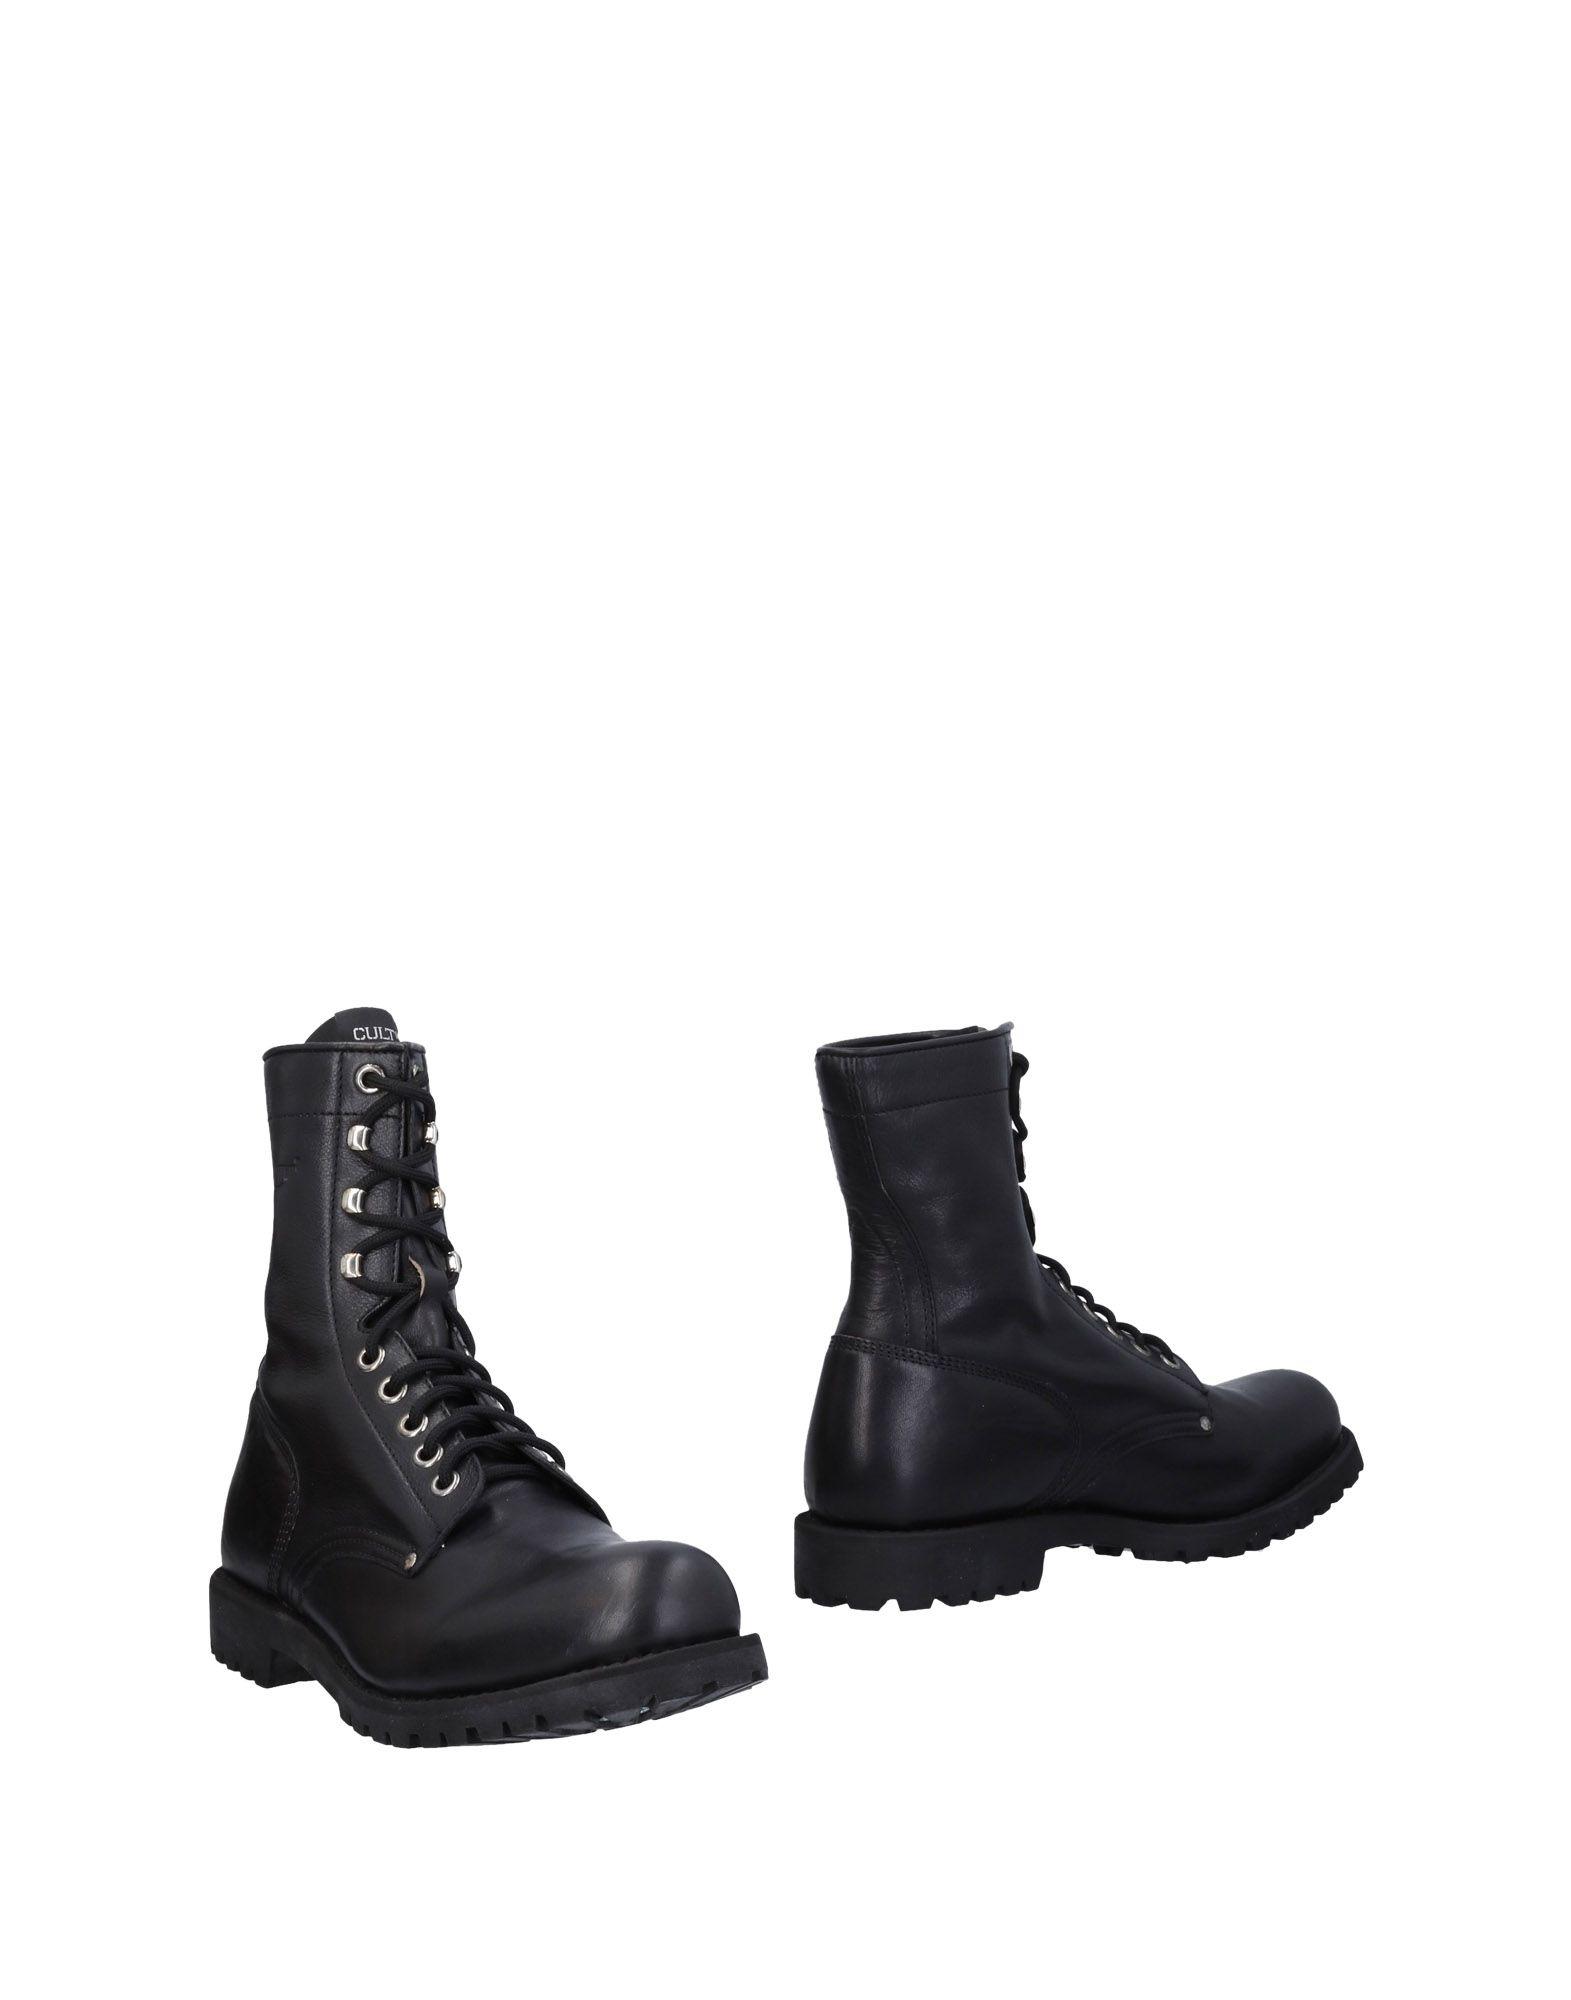 Rabatt echte Schuhe Cult Stiefelette Herren  11459366AN